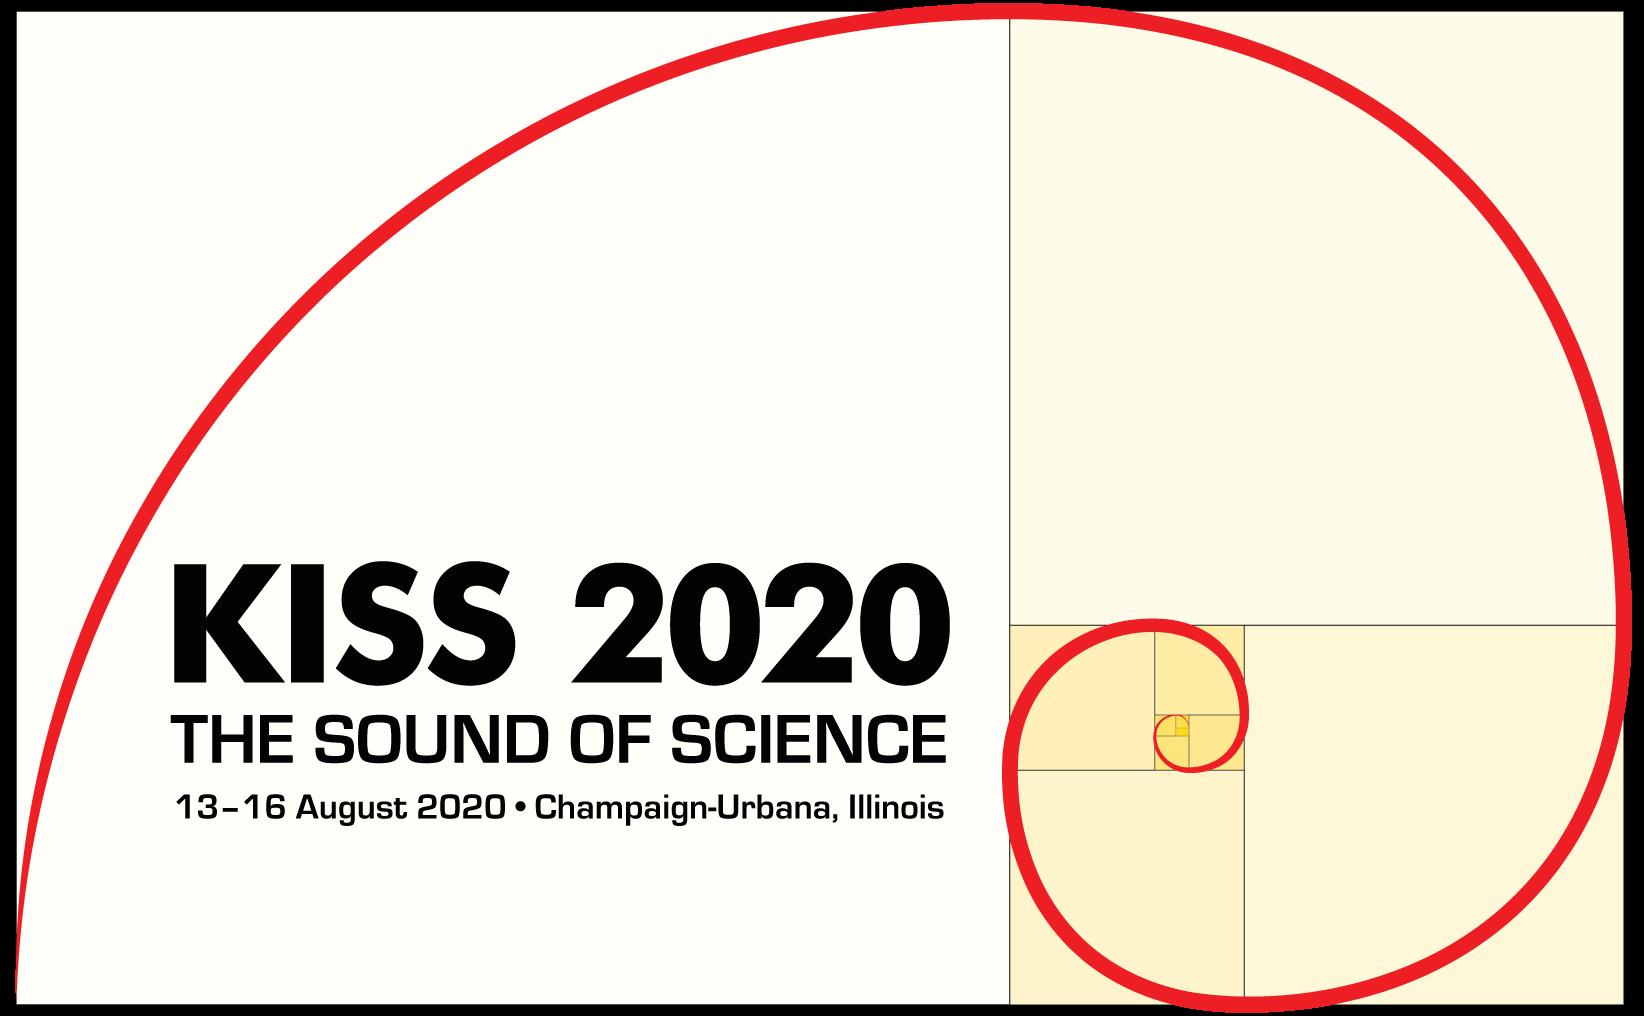 KISS 2020